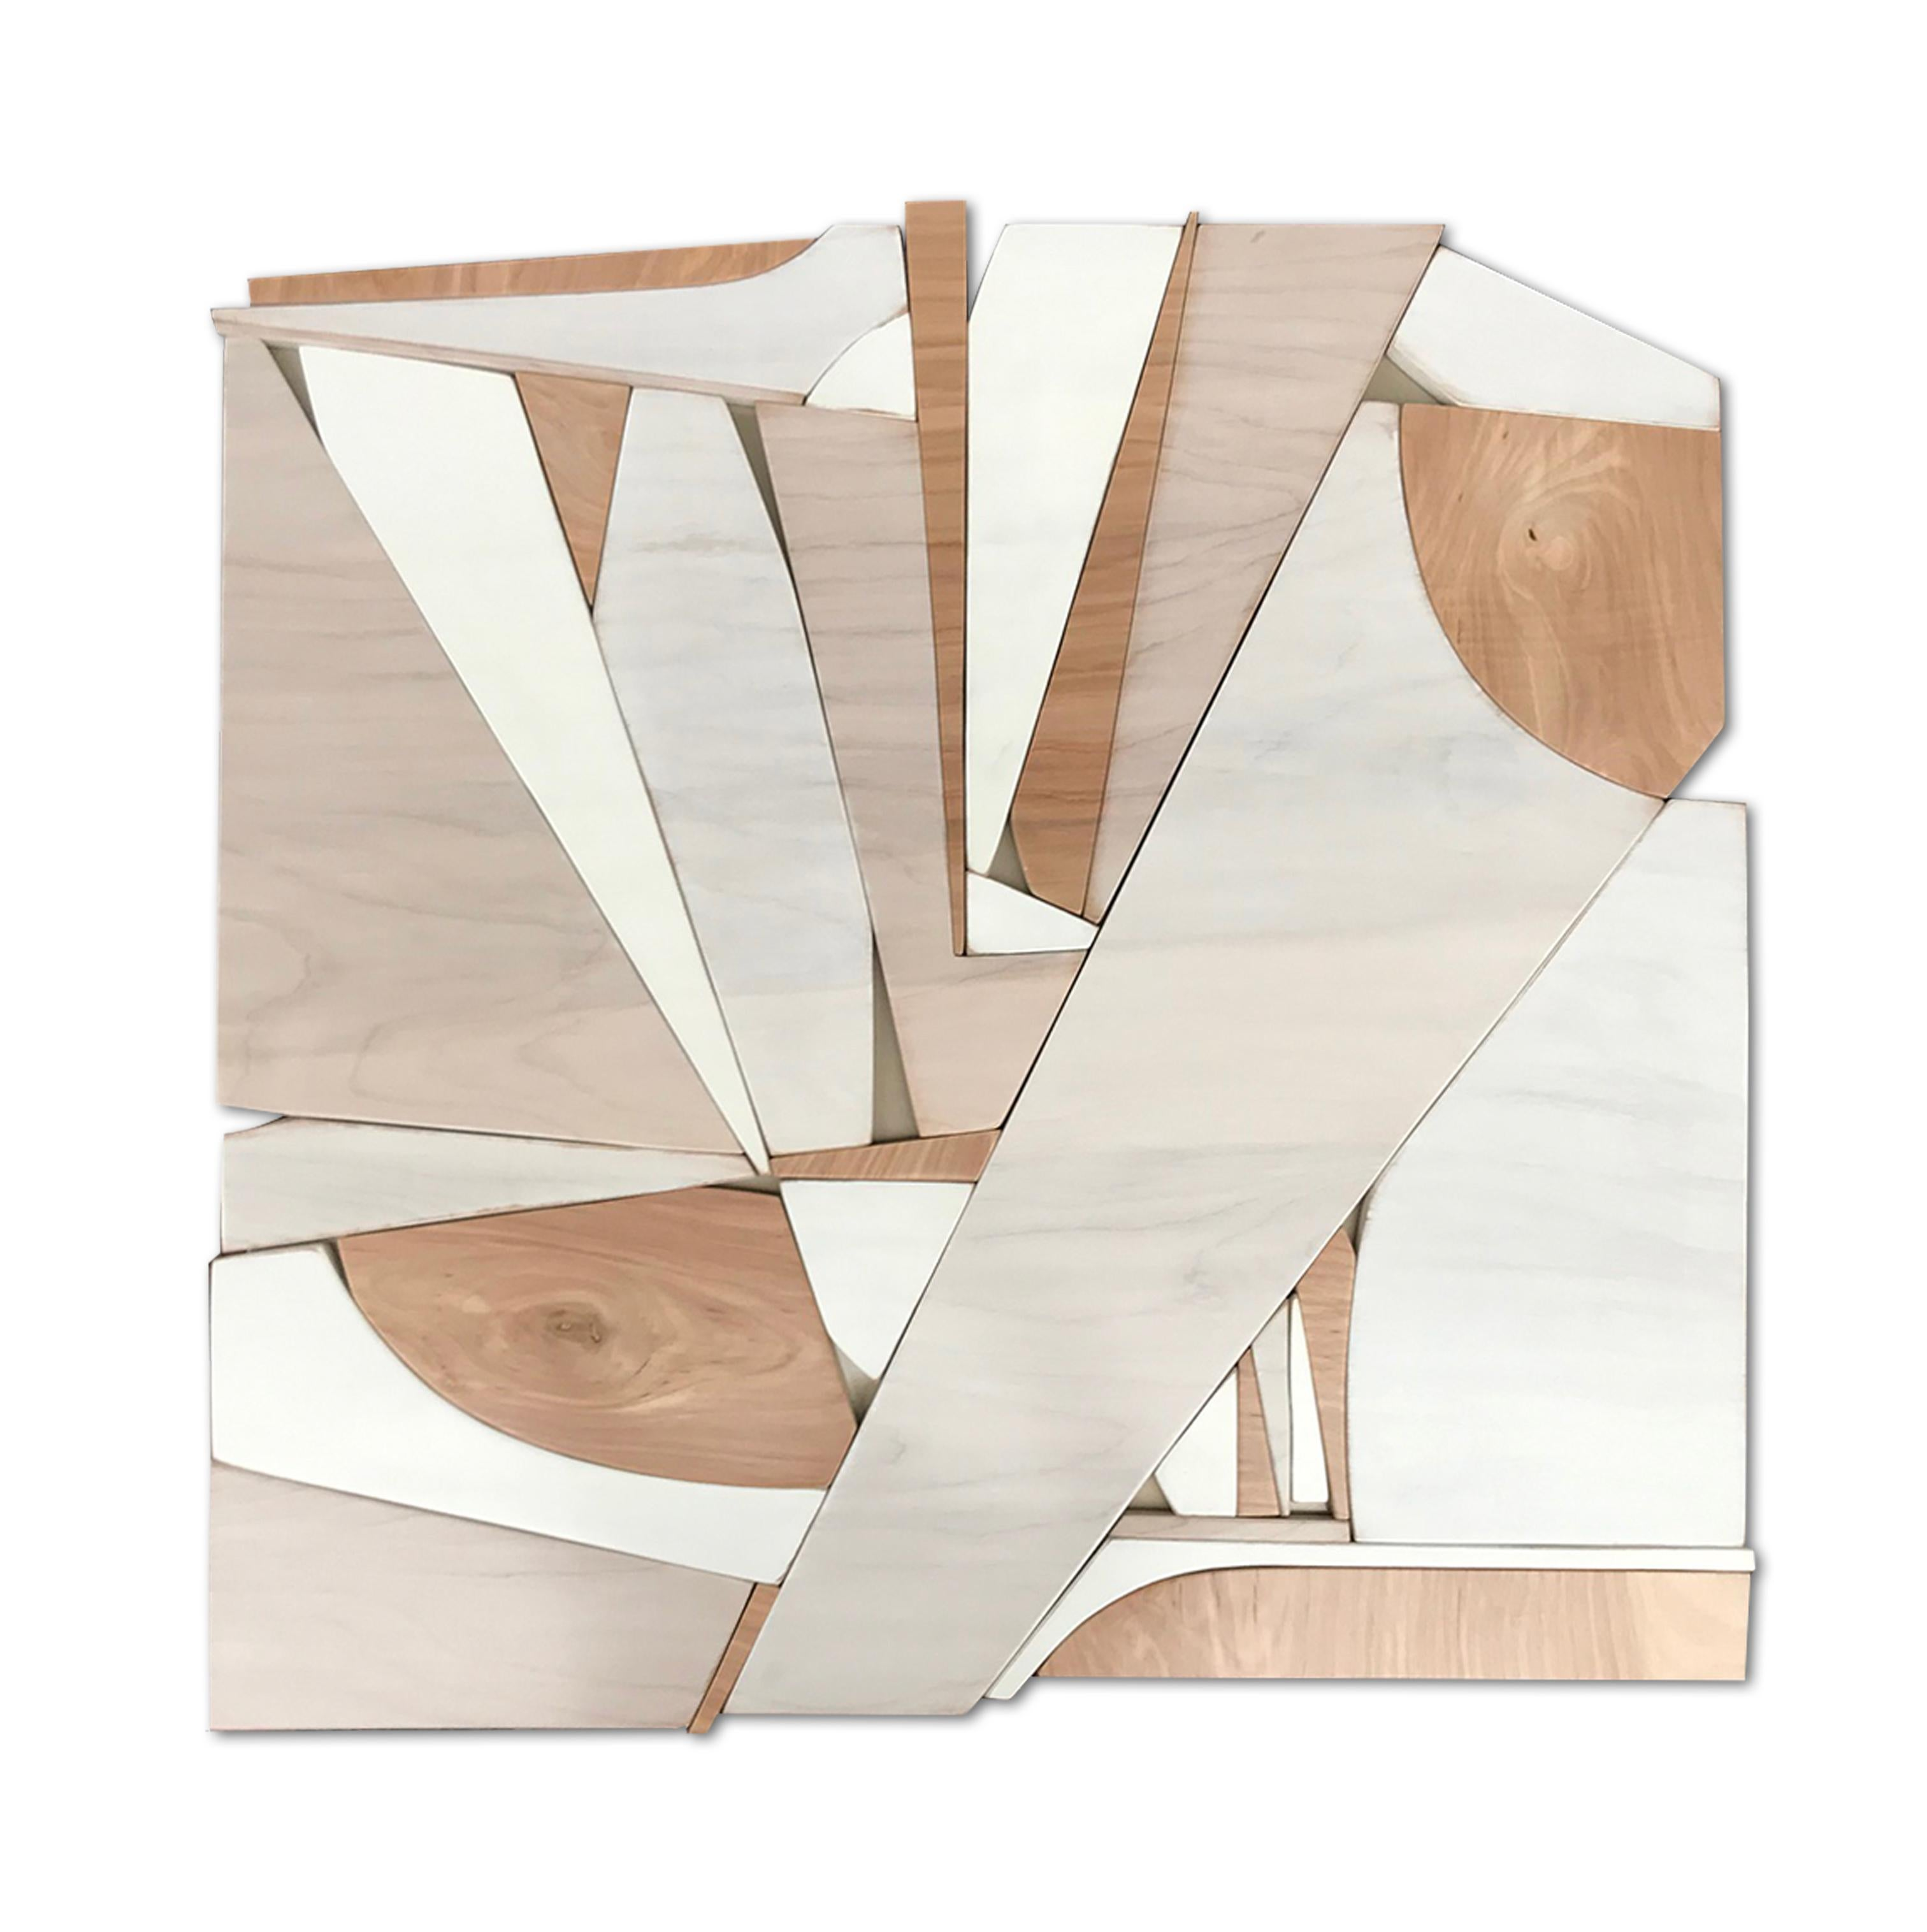 Parralax III (modern abstract wall sculpture minimal geometric design neutrals)